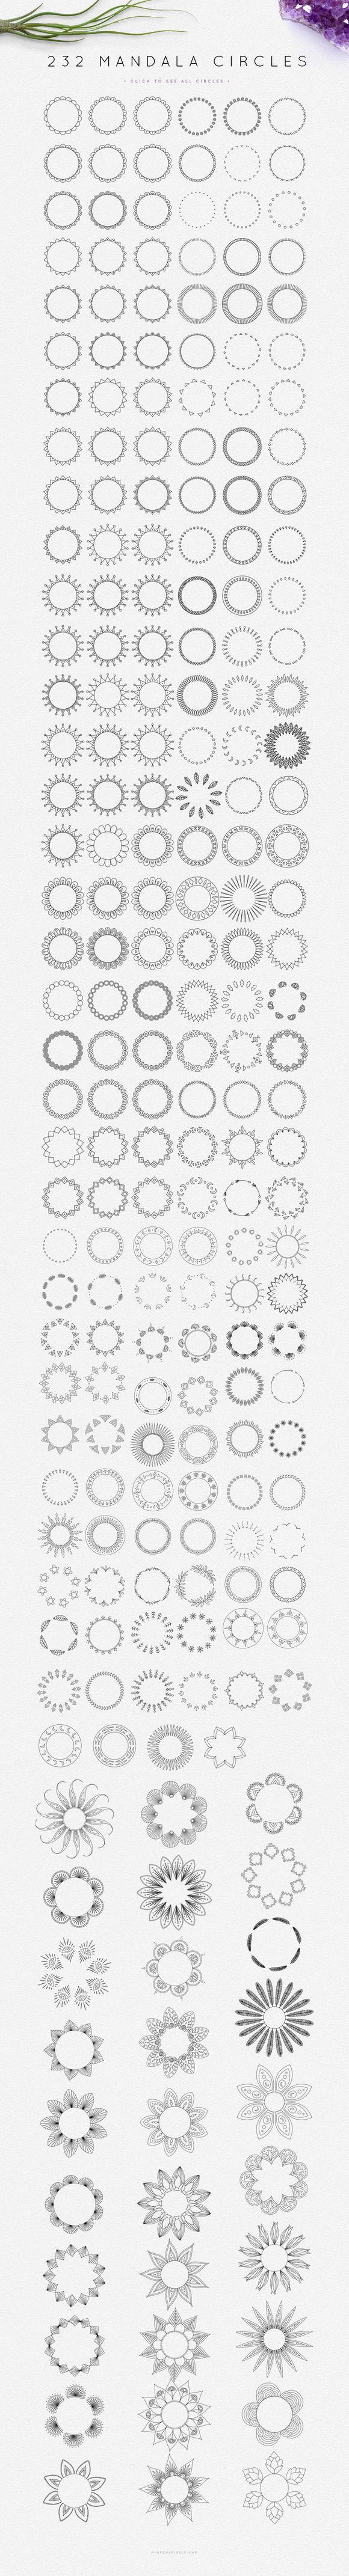 Mandala Logo Creator by Mindful Pixels on Behance